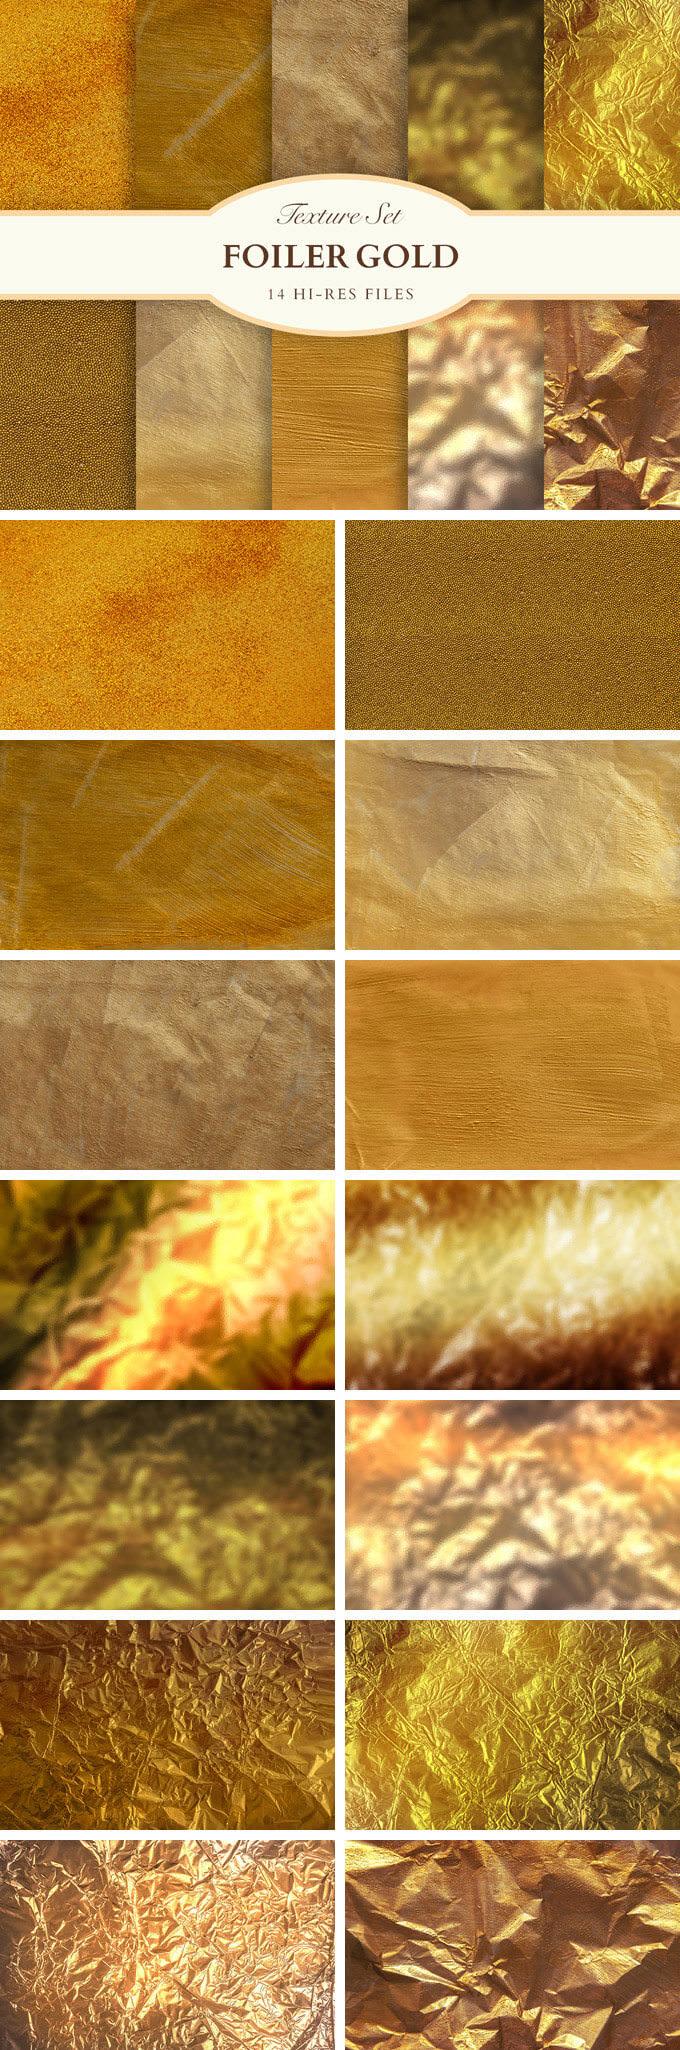 precious-gold-0textures-kit